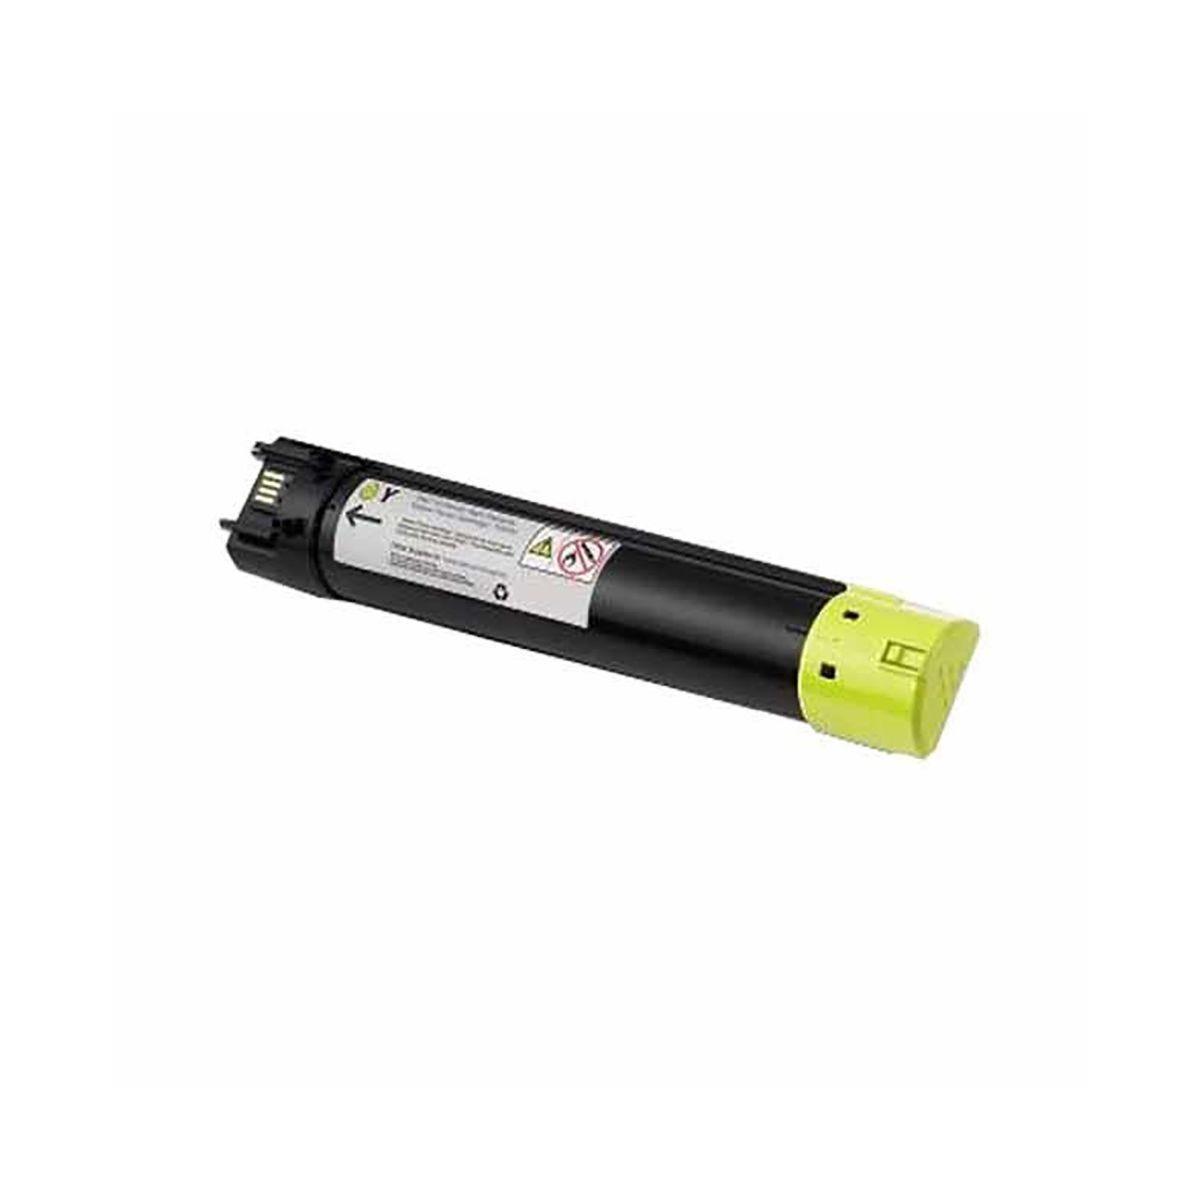 Dell 5130cdn Yellow Toner High Capacity